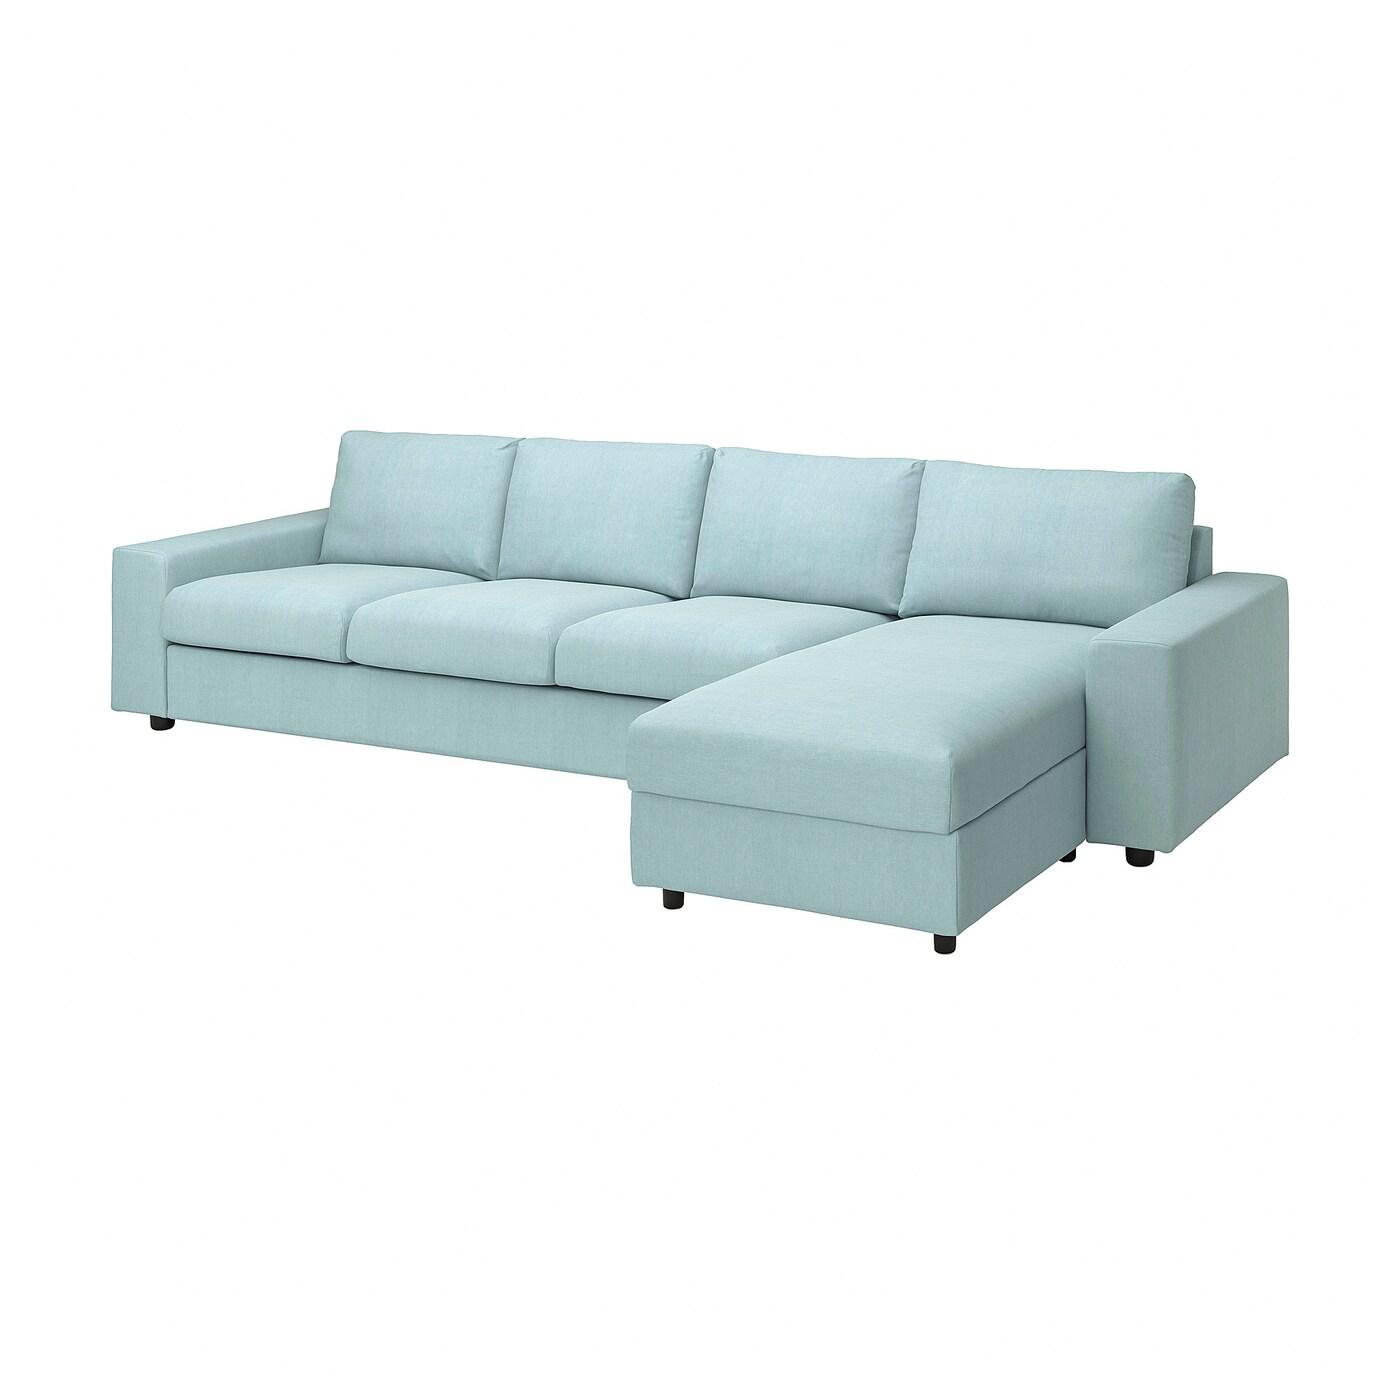 VIMLE 4er-Sofa mit Récamiere